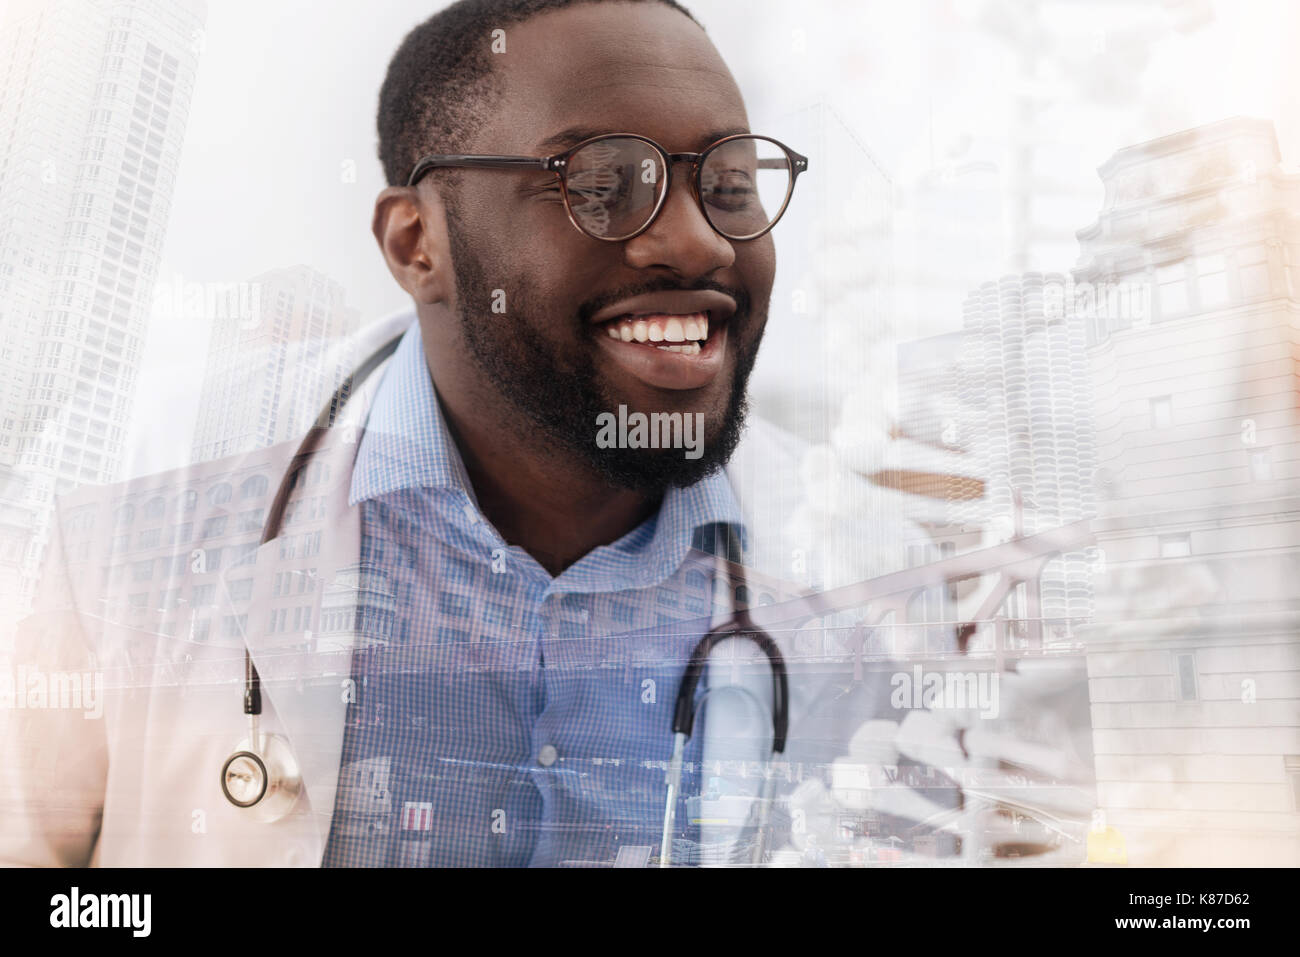 Optimistic skilled doctor smiling broadly - Stock Image